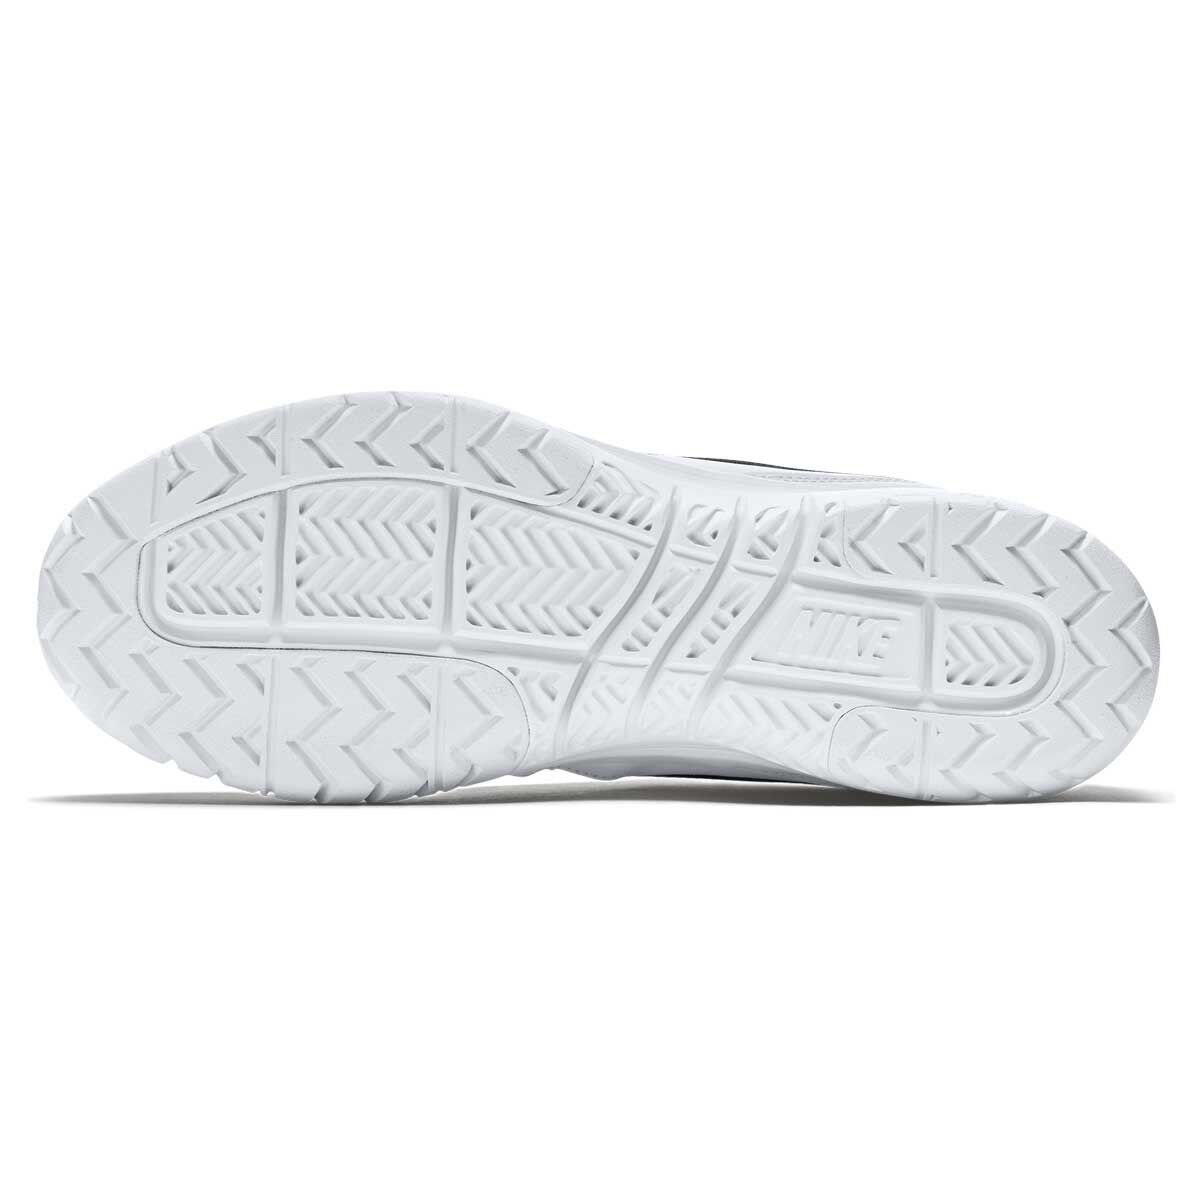 Nike Vapor Ace Mens Tennis Shoes White Black US 7